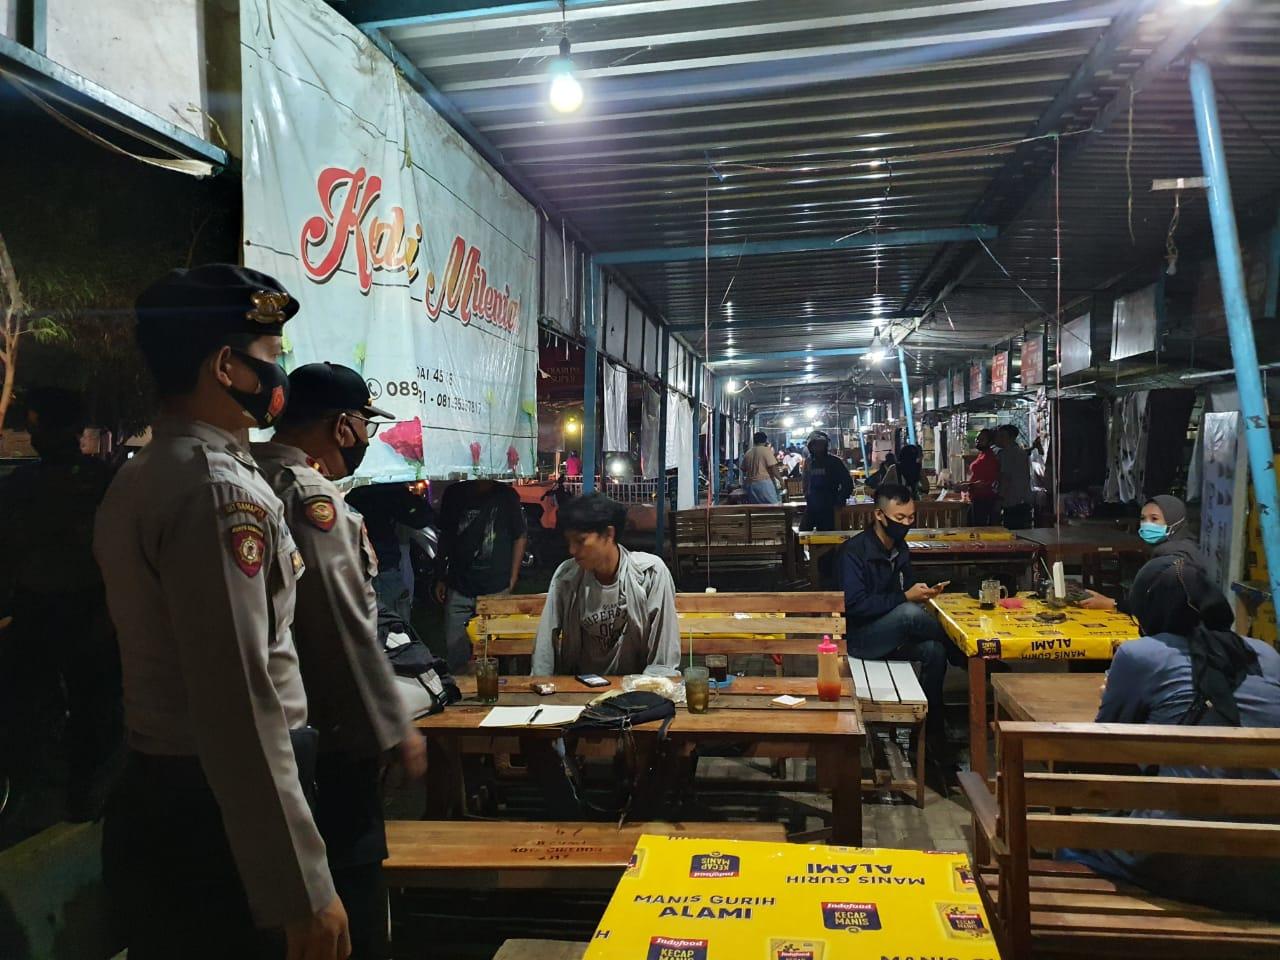 Patroli Gabungan Piket Fungsi Polres Cirebon Kota, Bubarkan Soft Opening Cafe